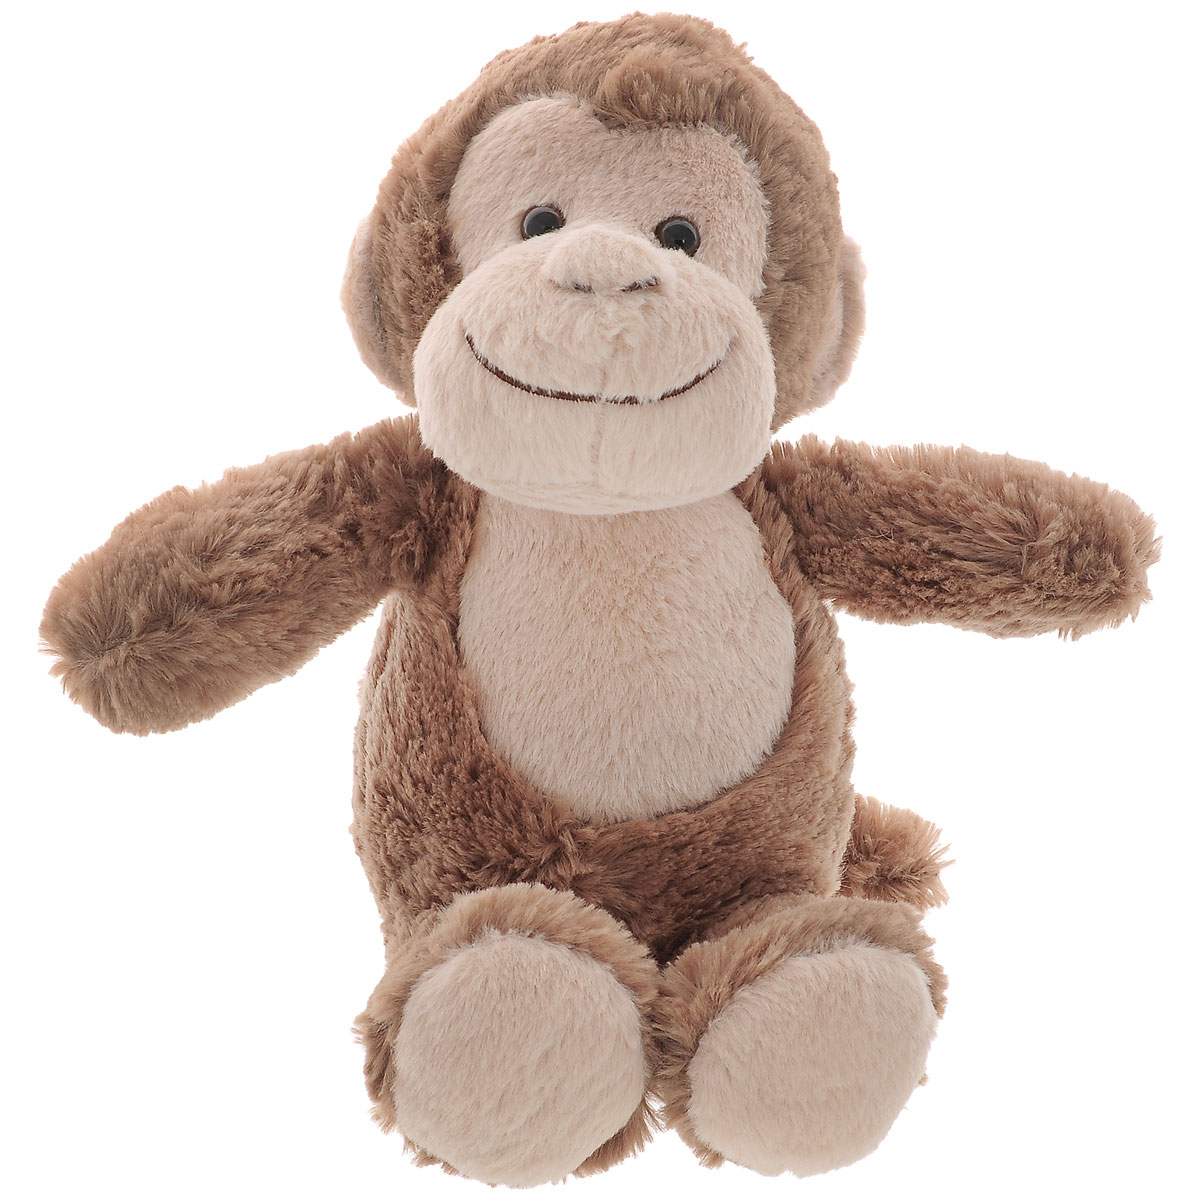 Мягкая игрушка Aurora Обезьянка, 21 см цена